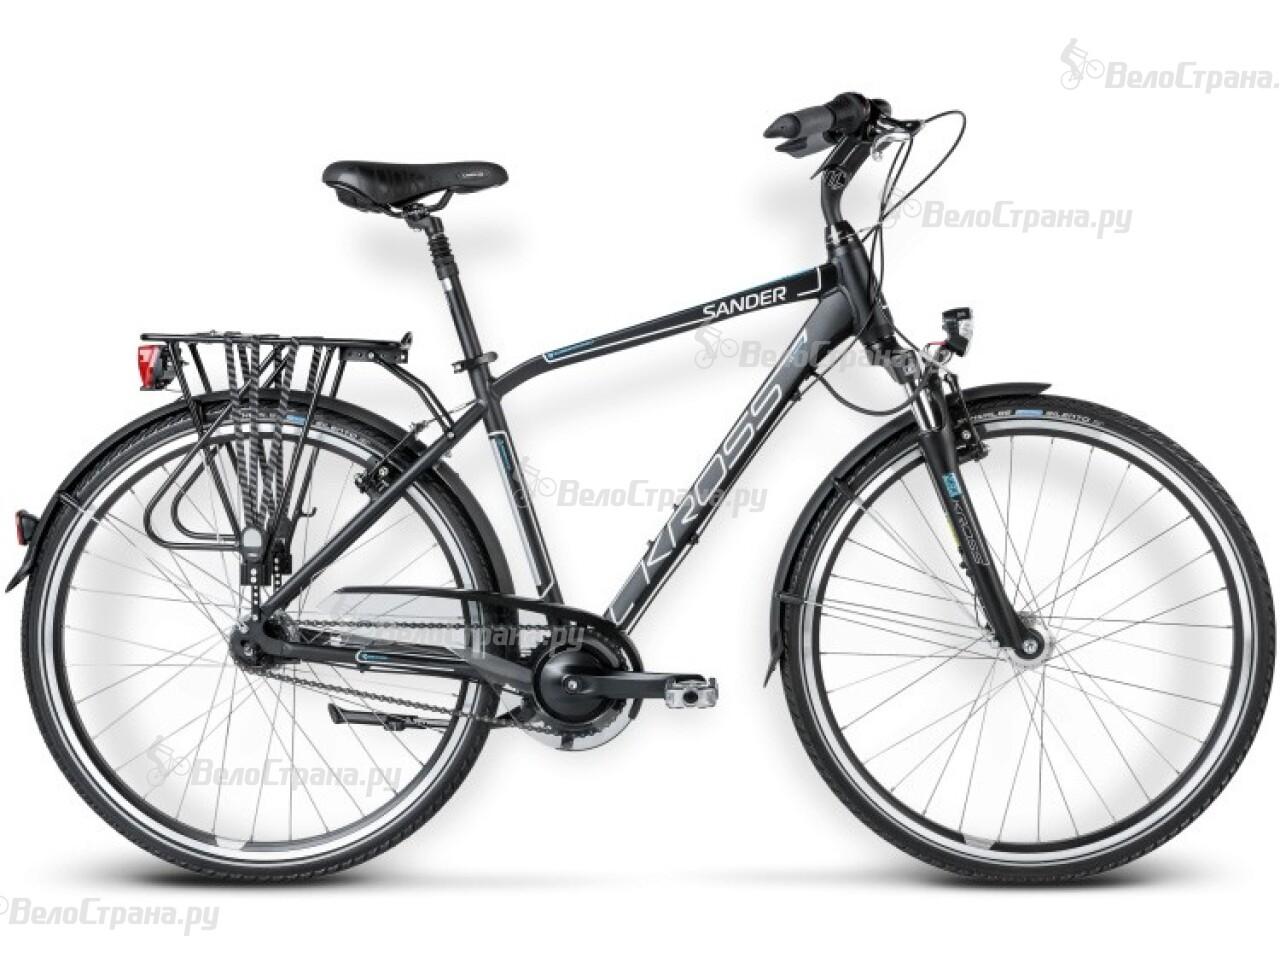 Велосипед Kross TRANS SANDER (2016) велосипед kross trans sander 2015